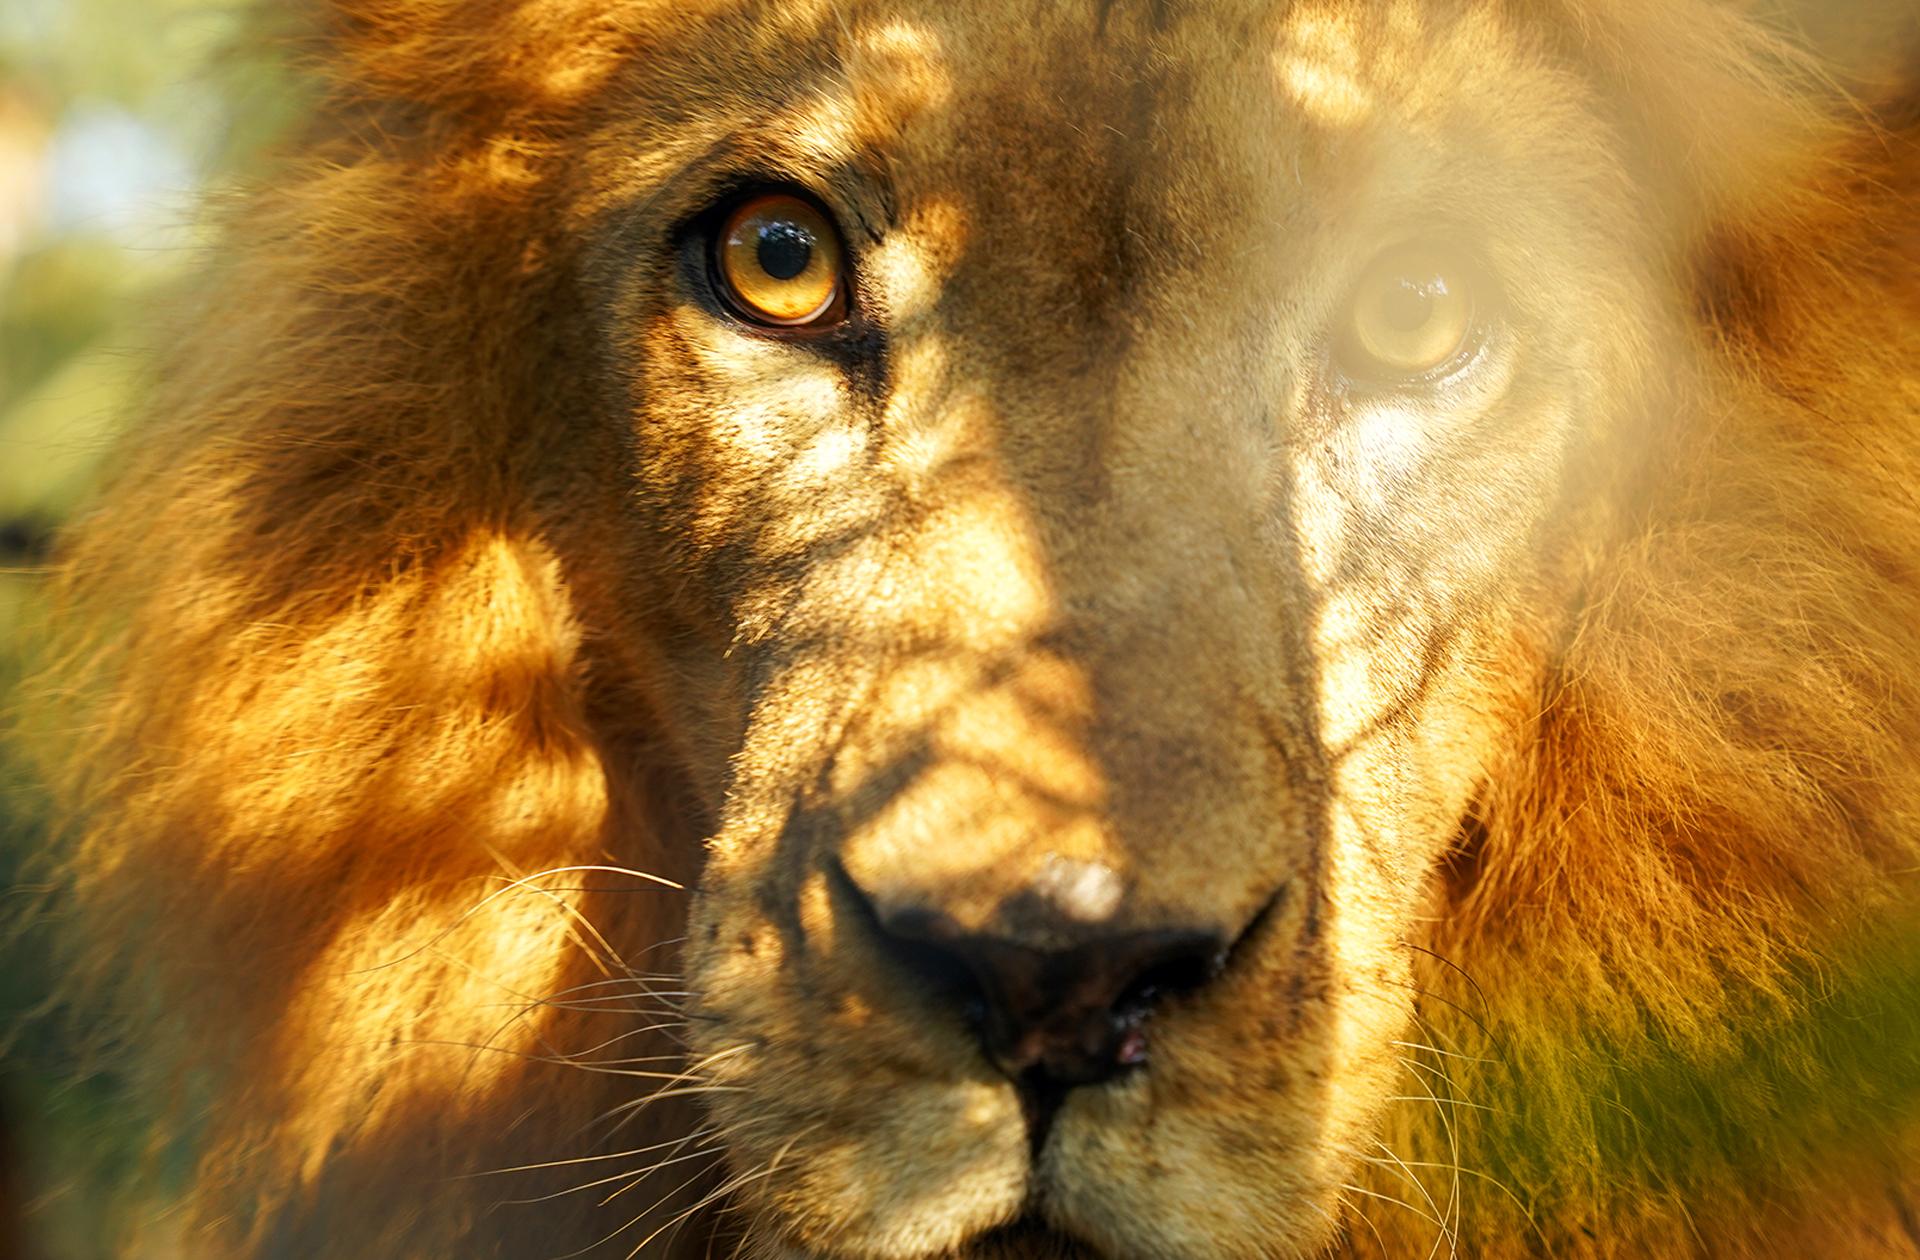 leon-piscilago-colsubsidio-6